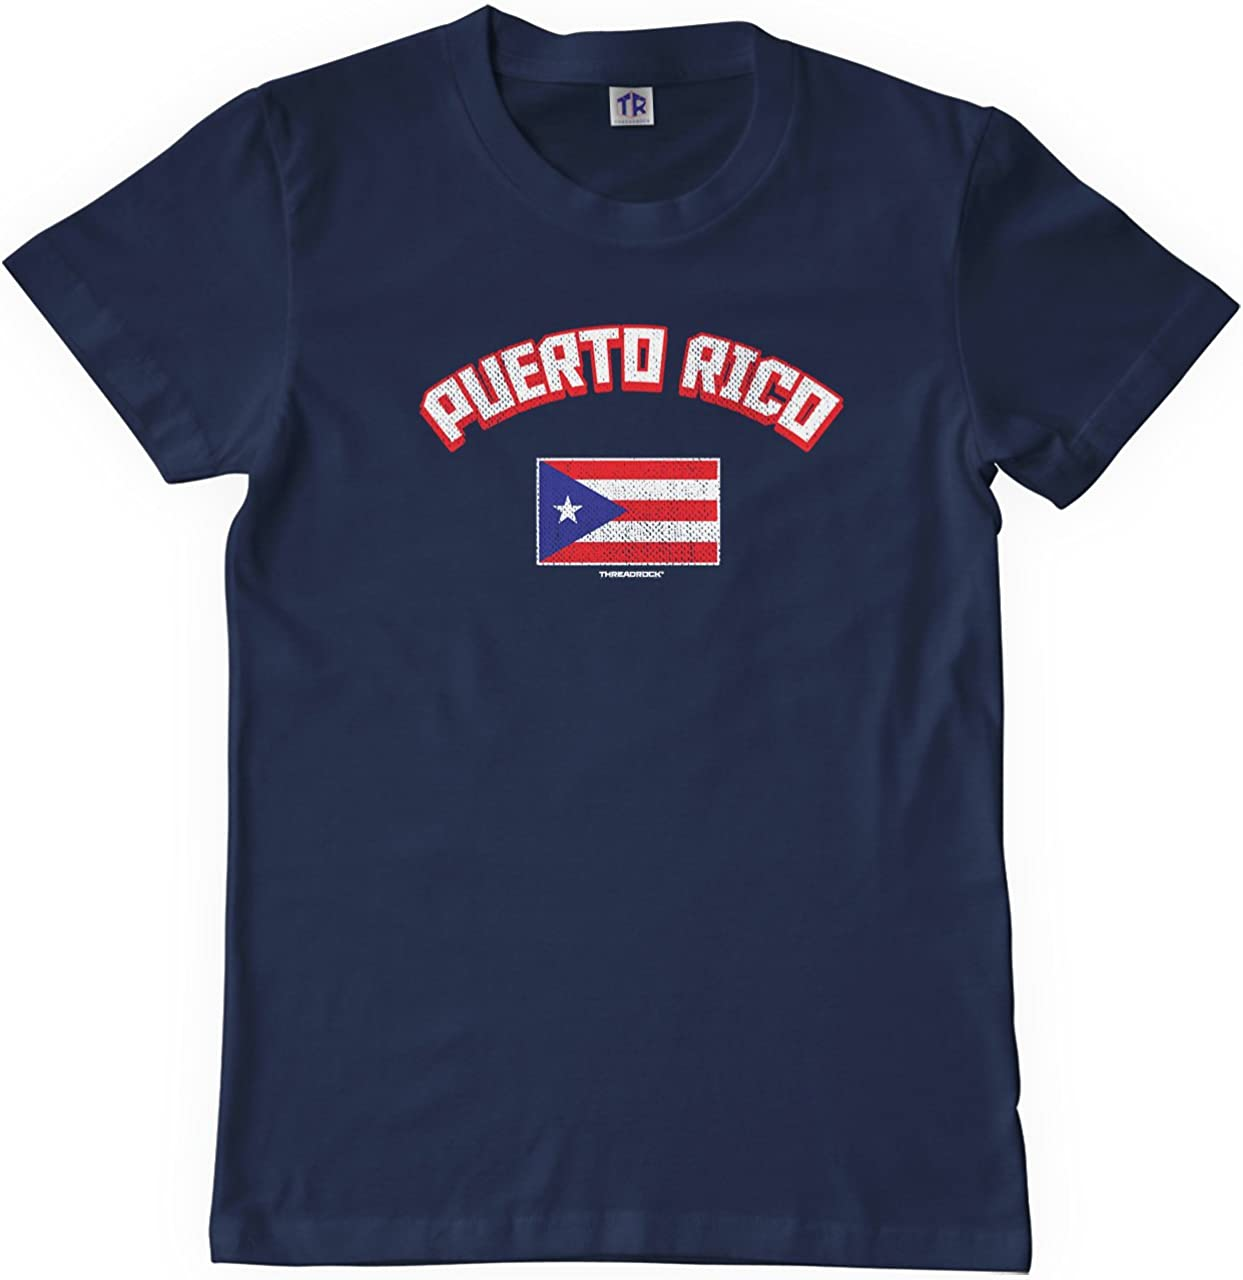 Kids Puerto Rican Pride Cute T-Shirt Short Sleeve Tee for 2-6 Years Old